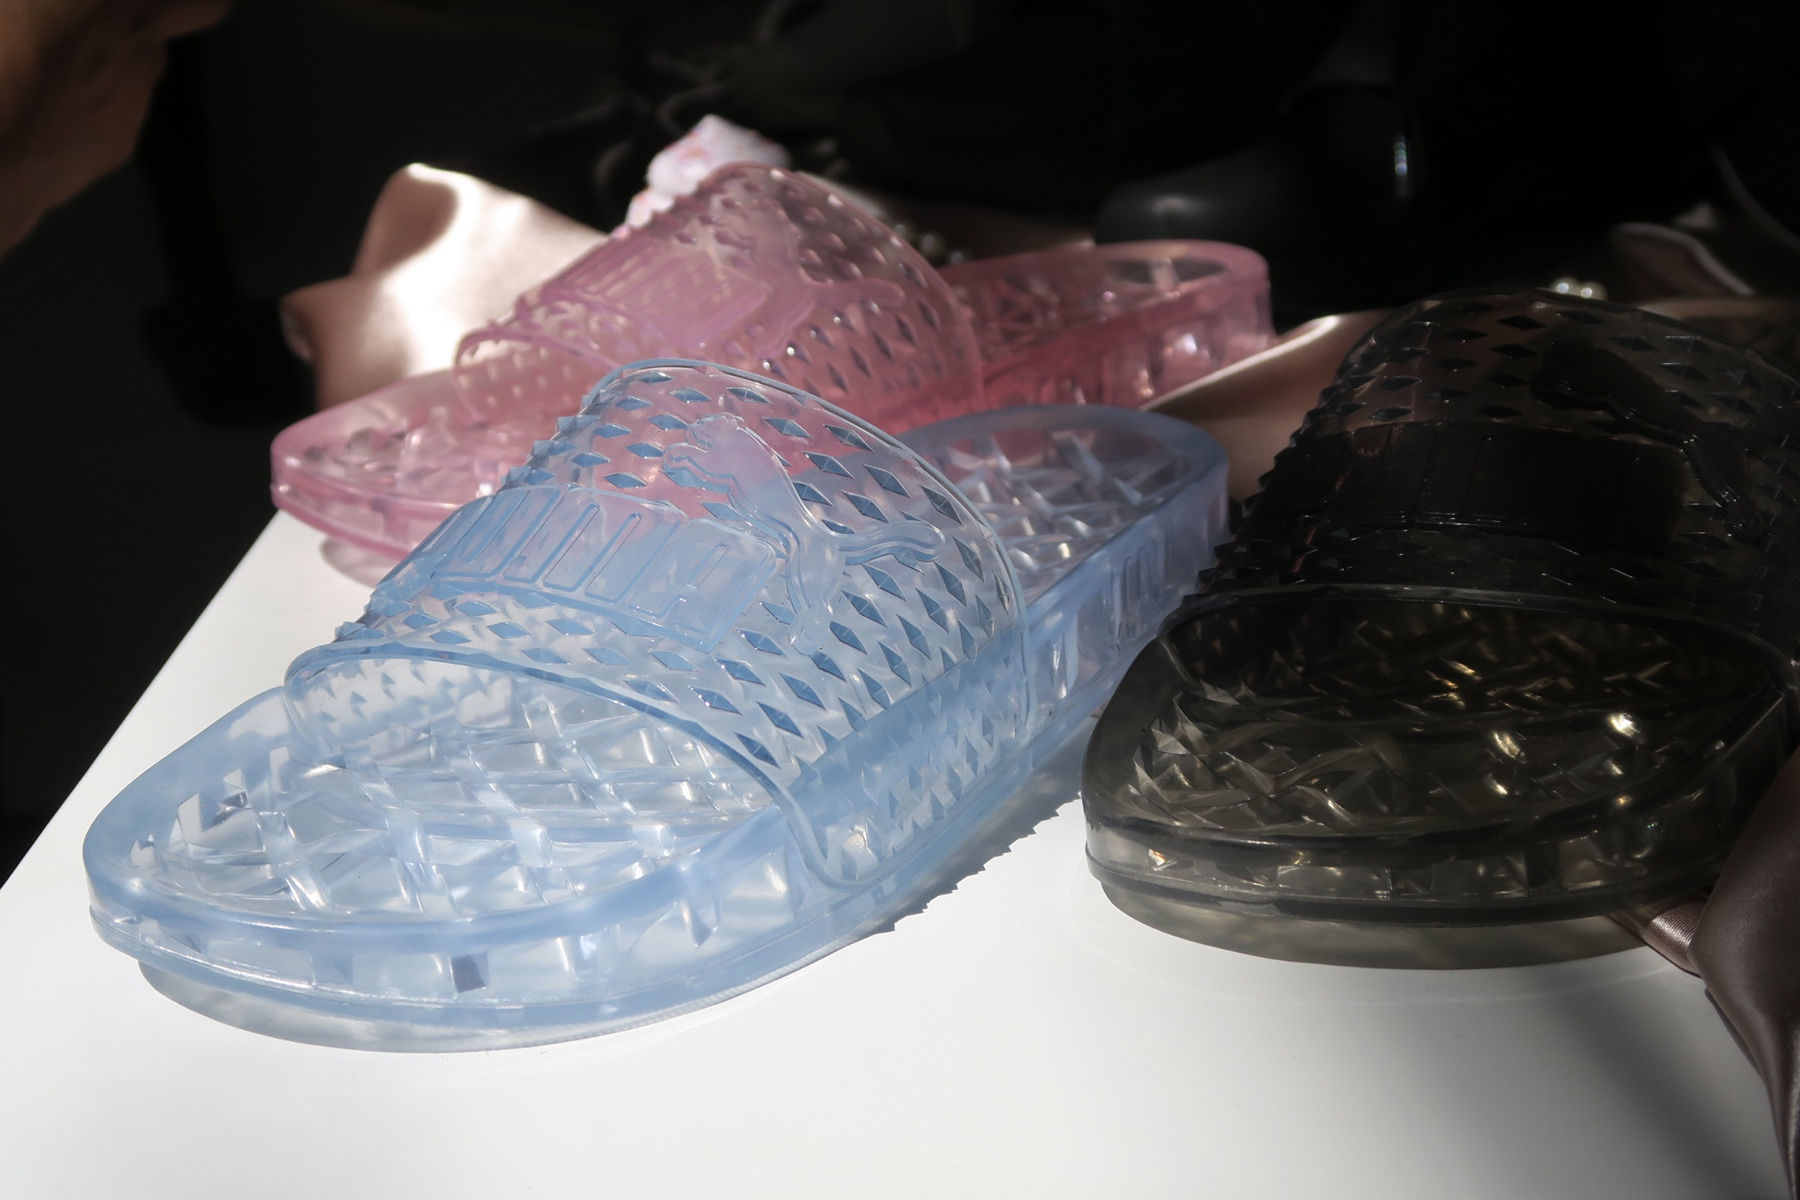 Découvrez les Fenty PUMA Jelly Slides by Rihanna